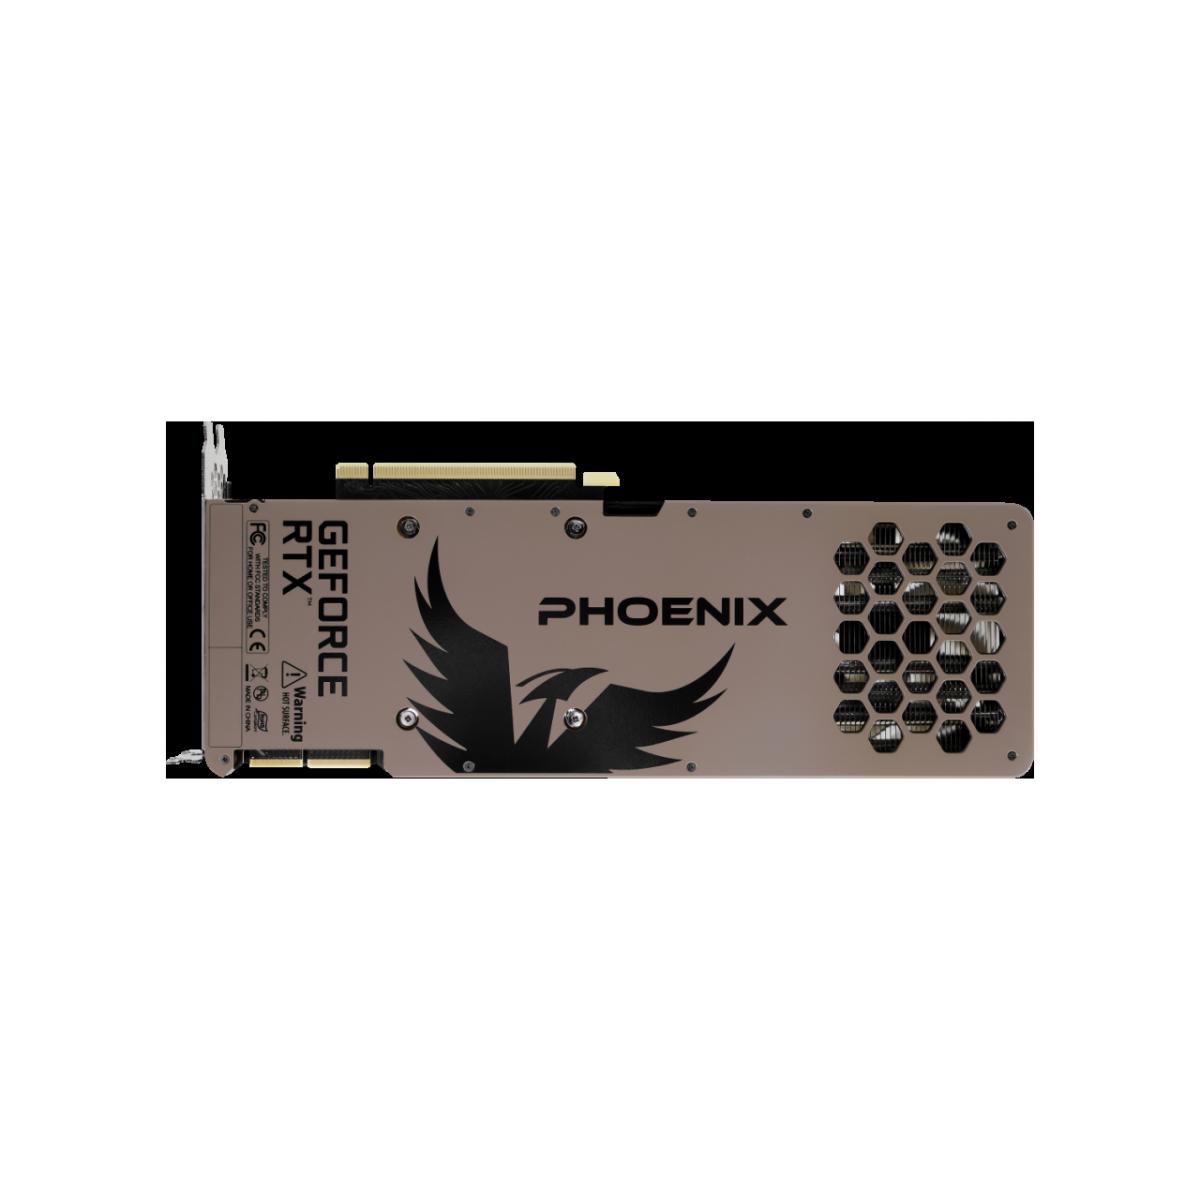 Placa de Vídeo Gainward, GeForce RTX 3070 Phoenix, 8GB, GDDR6, 256Bit, NE63070019P2-1041X